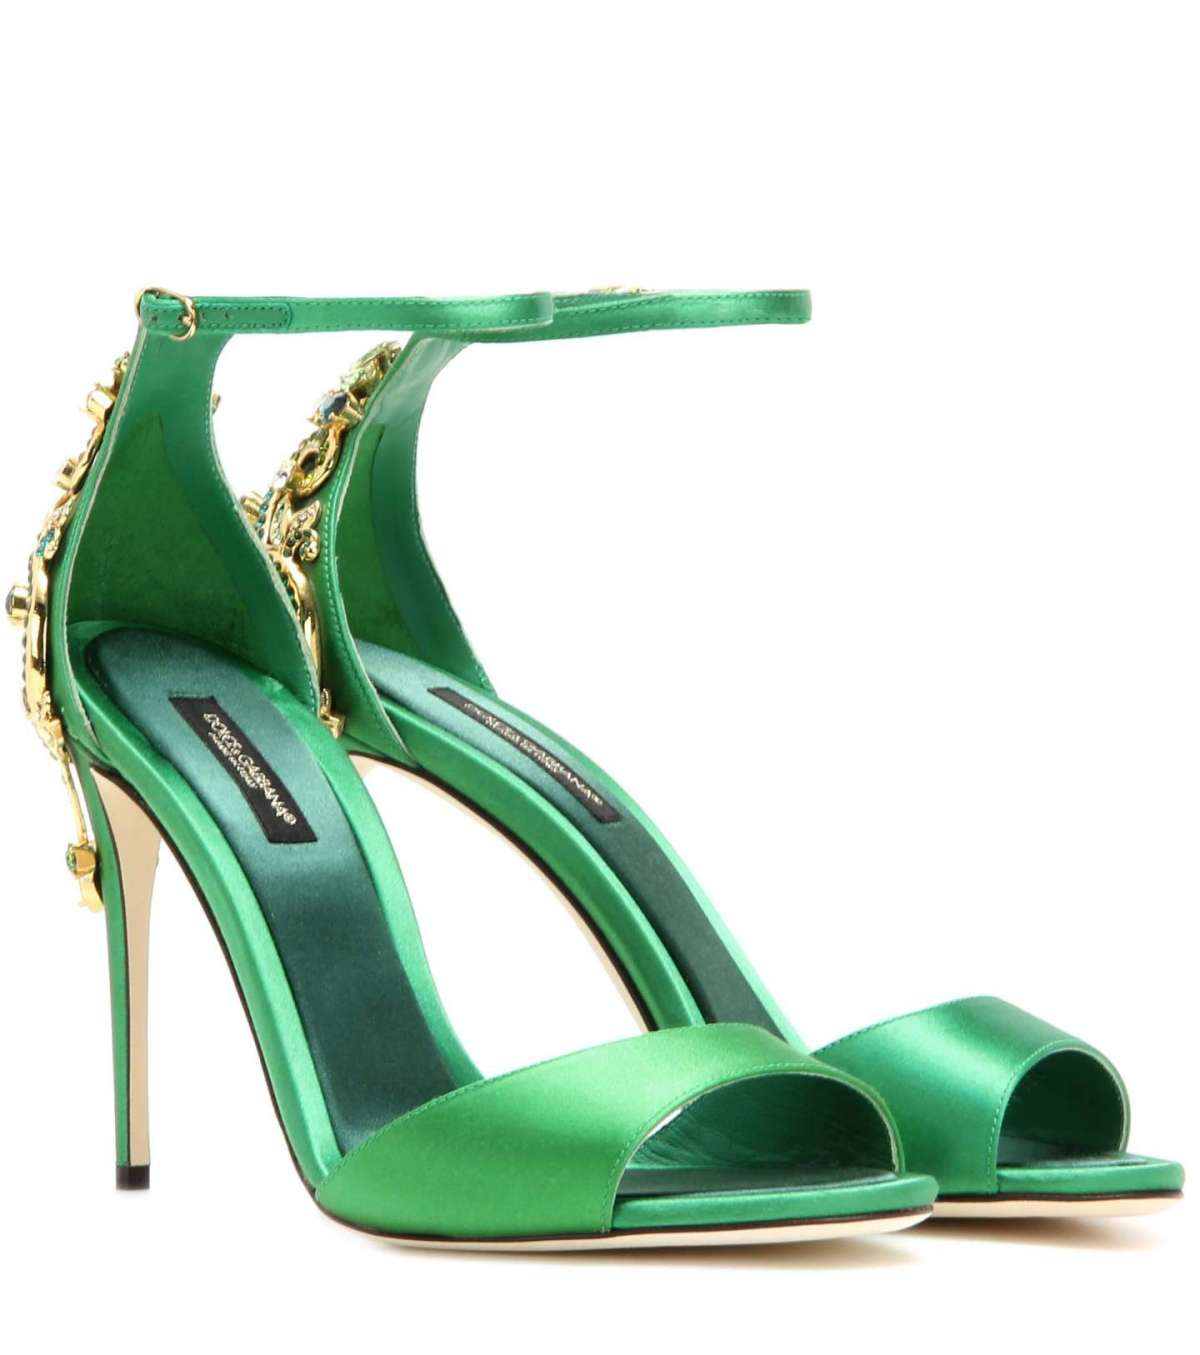 Sandali gioiello Dolce & Gabbana